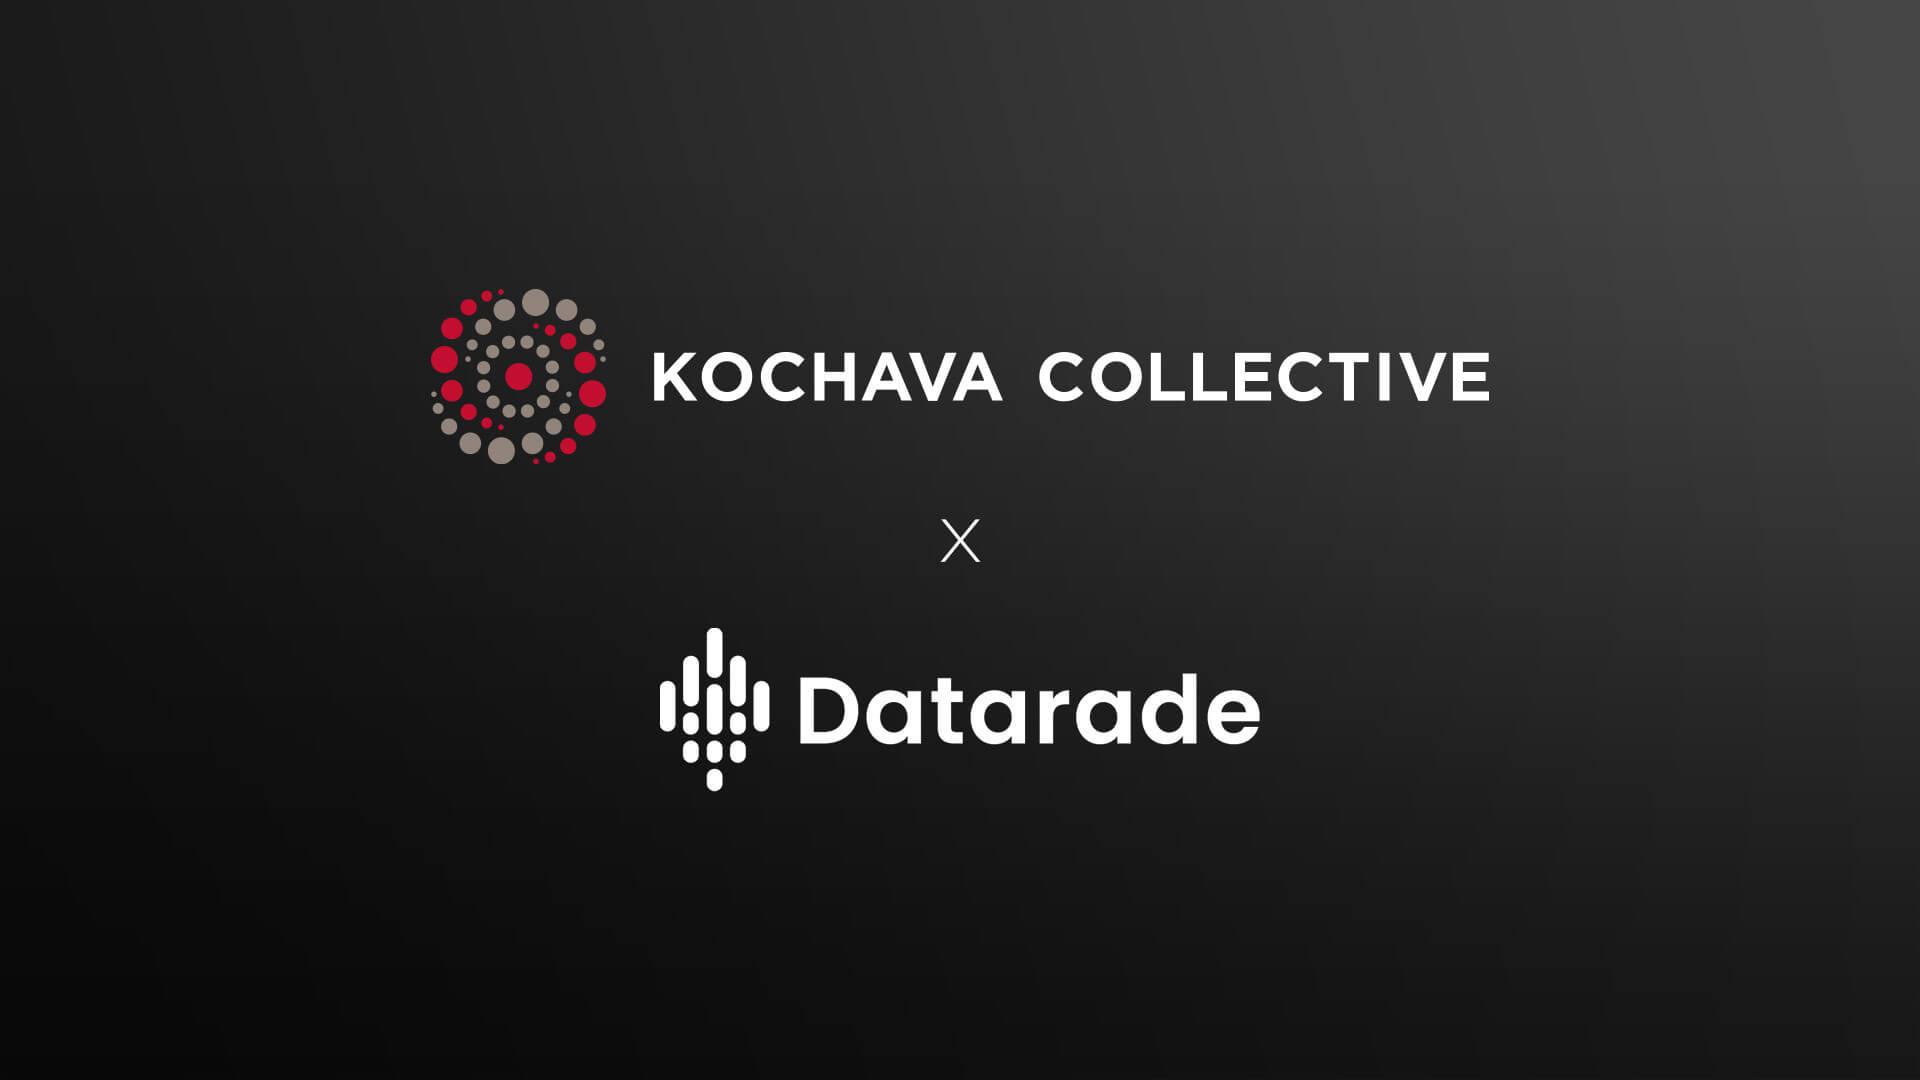 Kochava Collective and Datarade